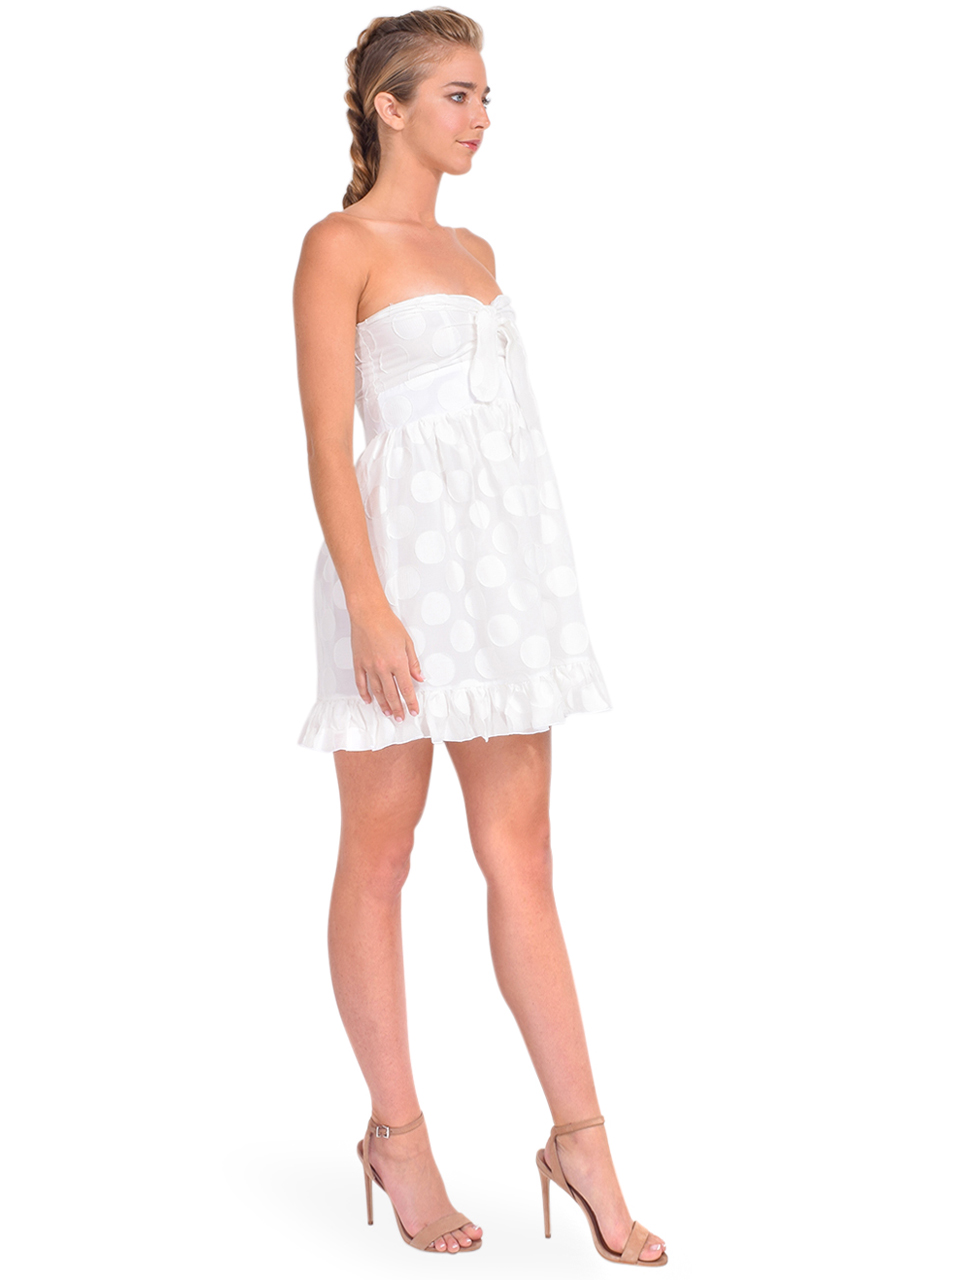 Karina Grimaldi Annie Dot Mini Dress in White Side View